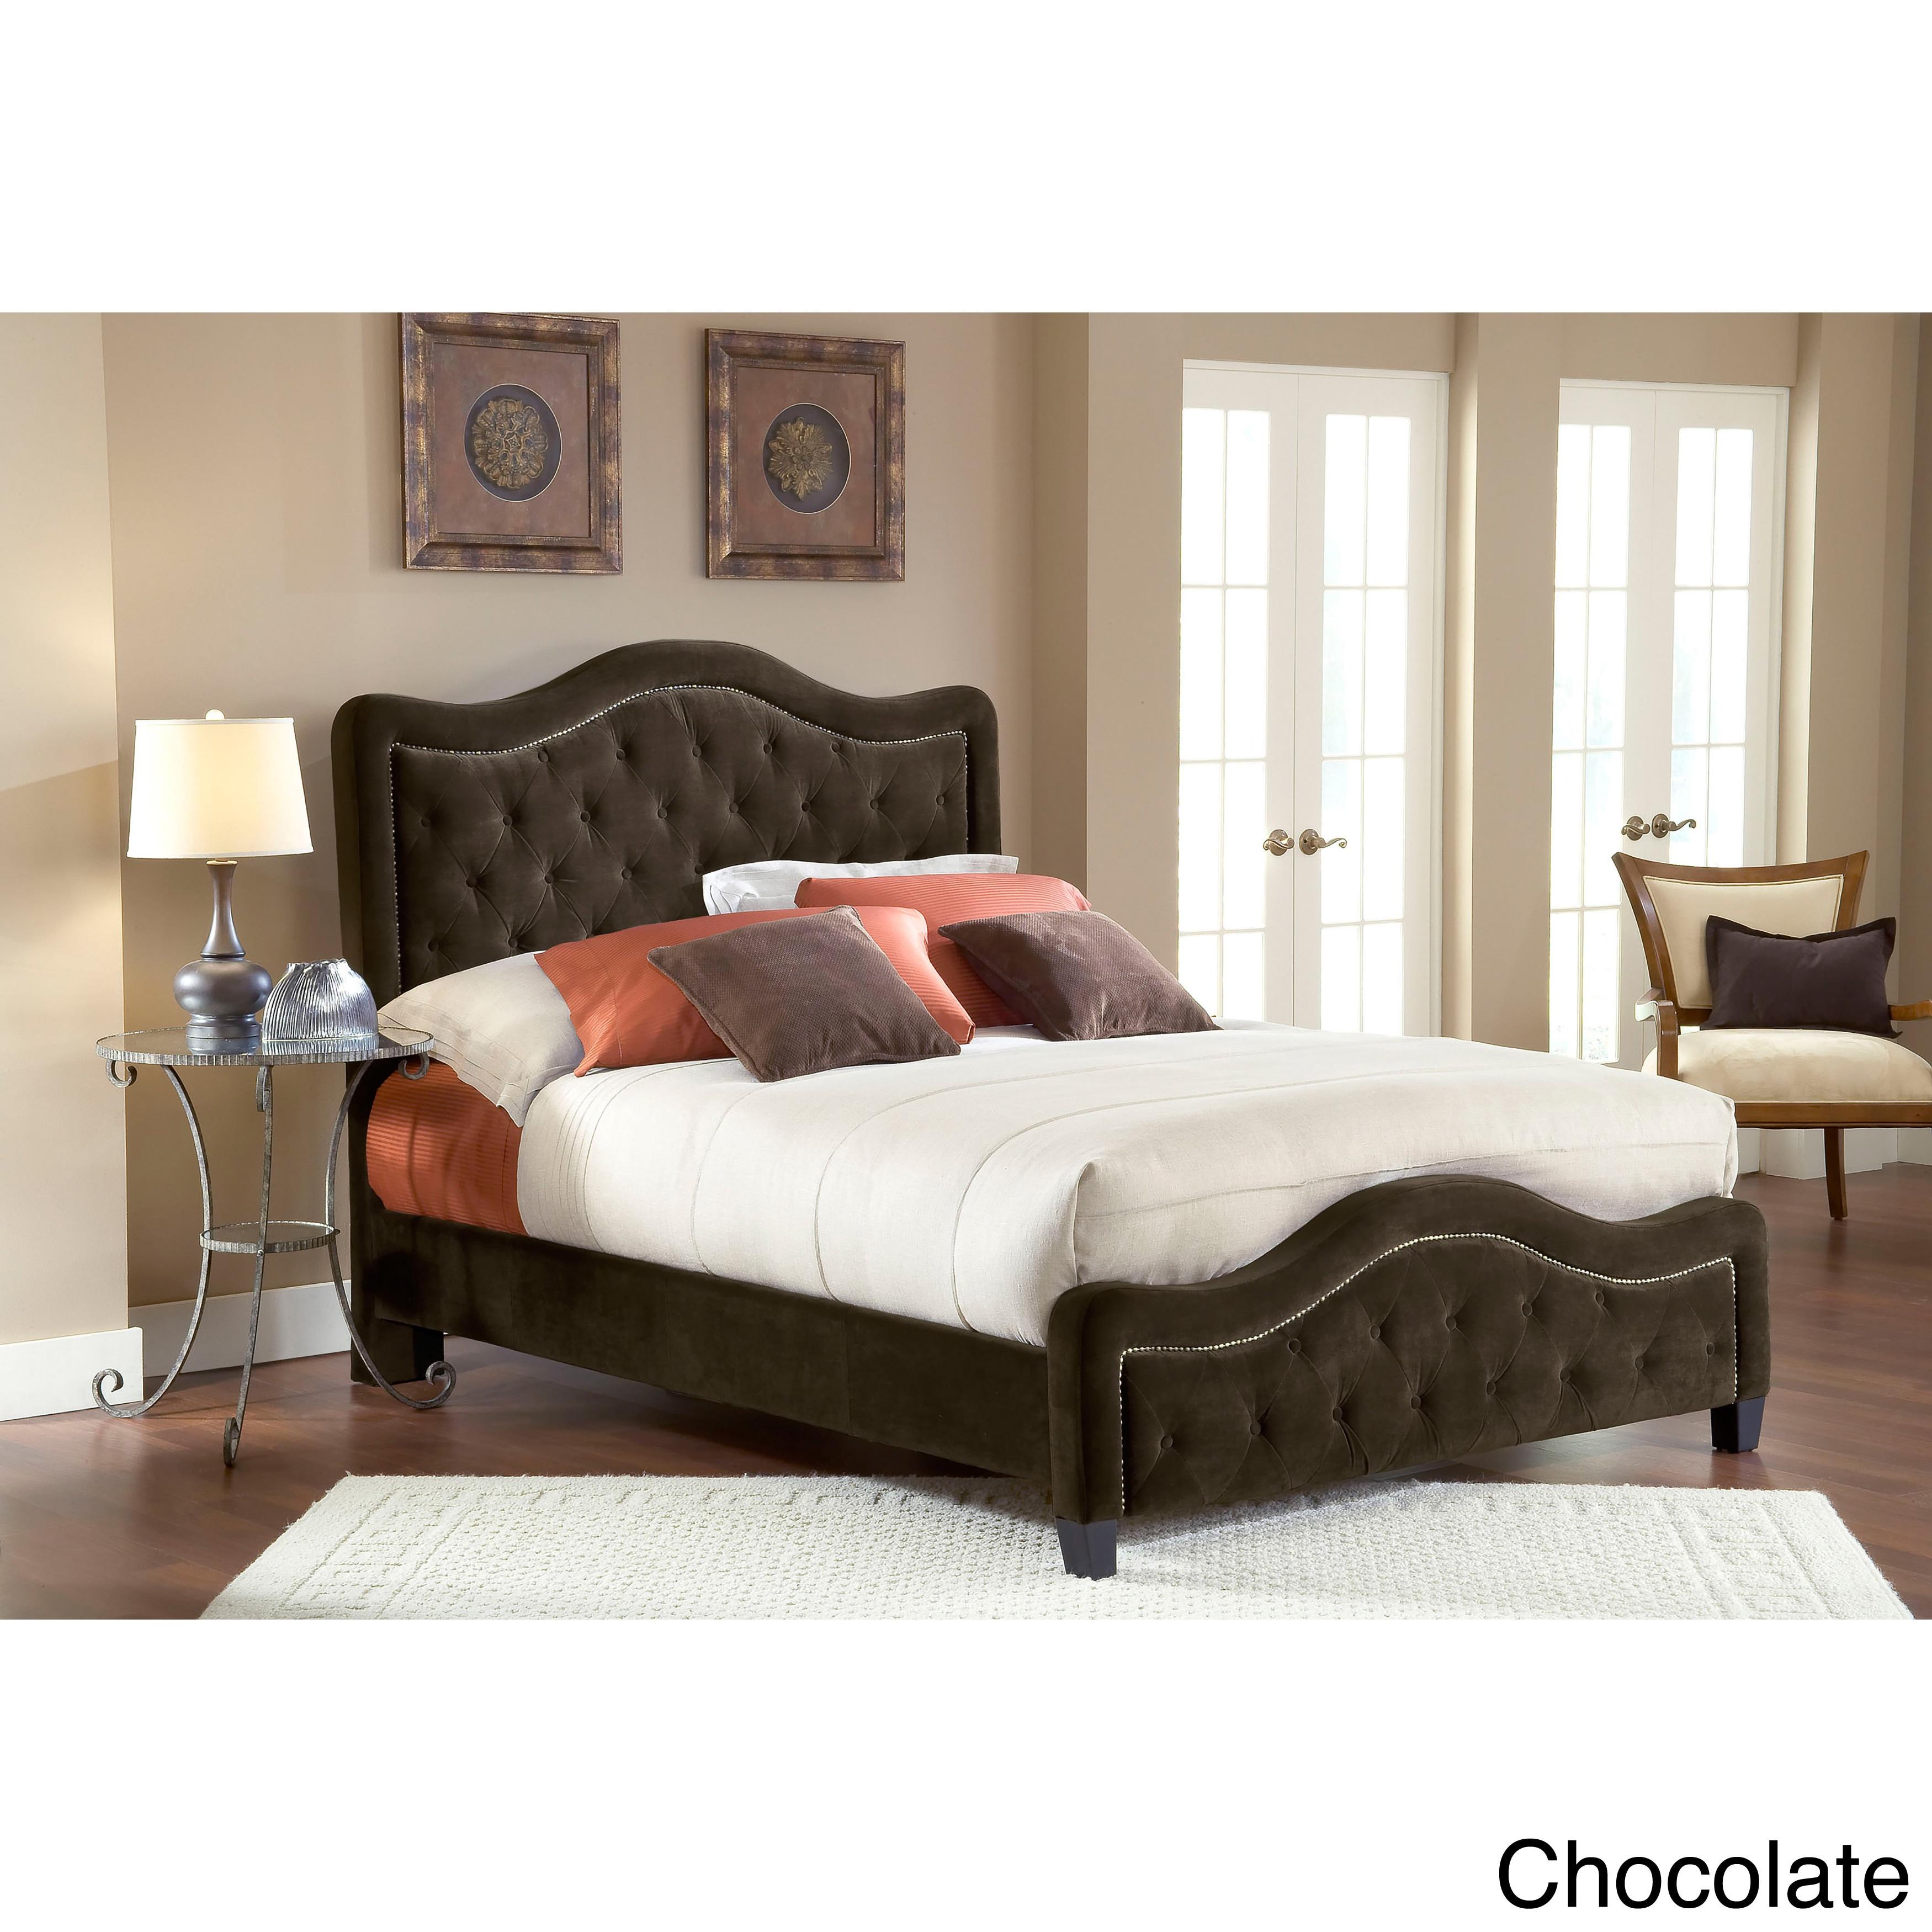 dreams king bedroom best photo just california set mattress for